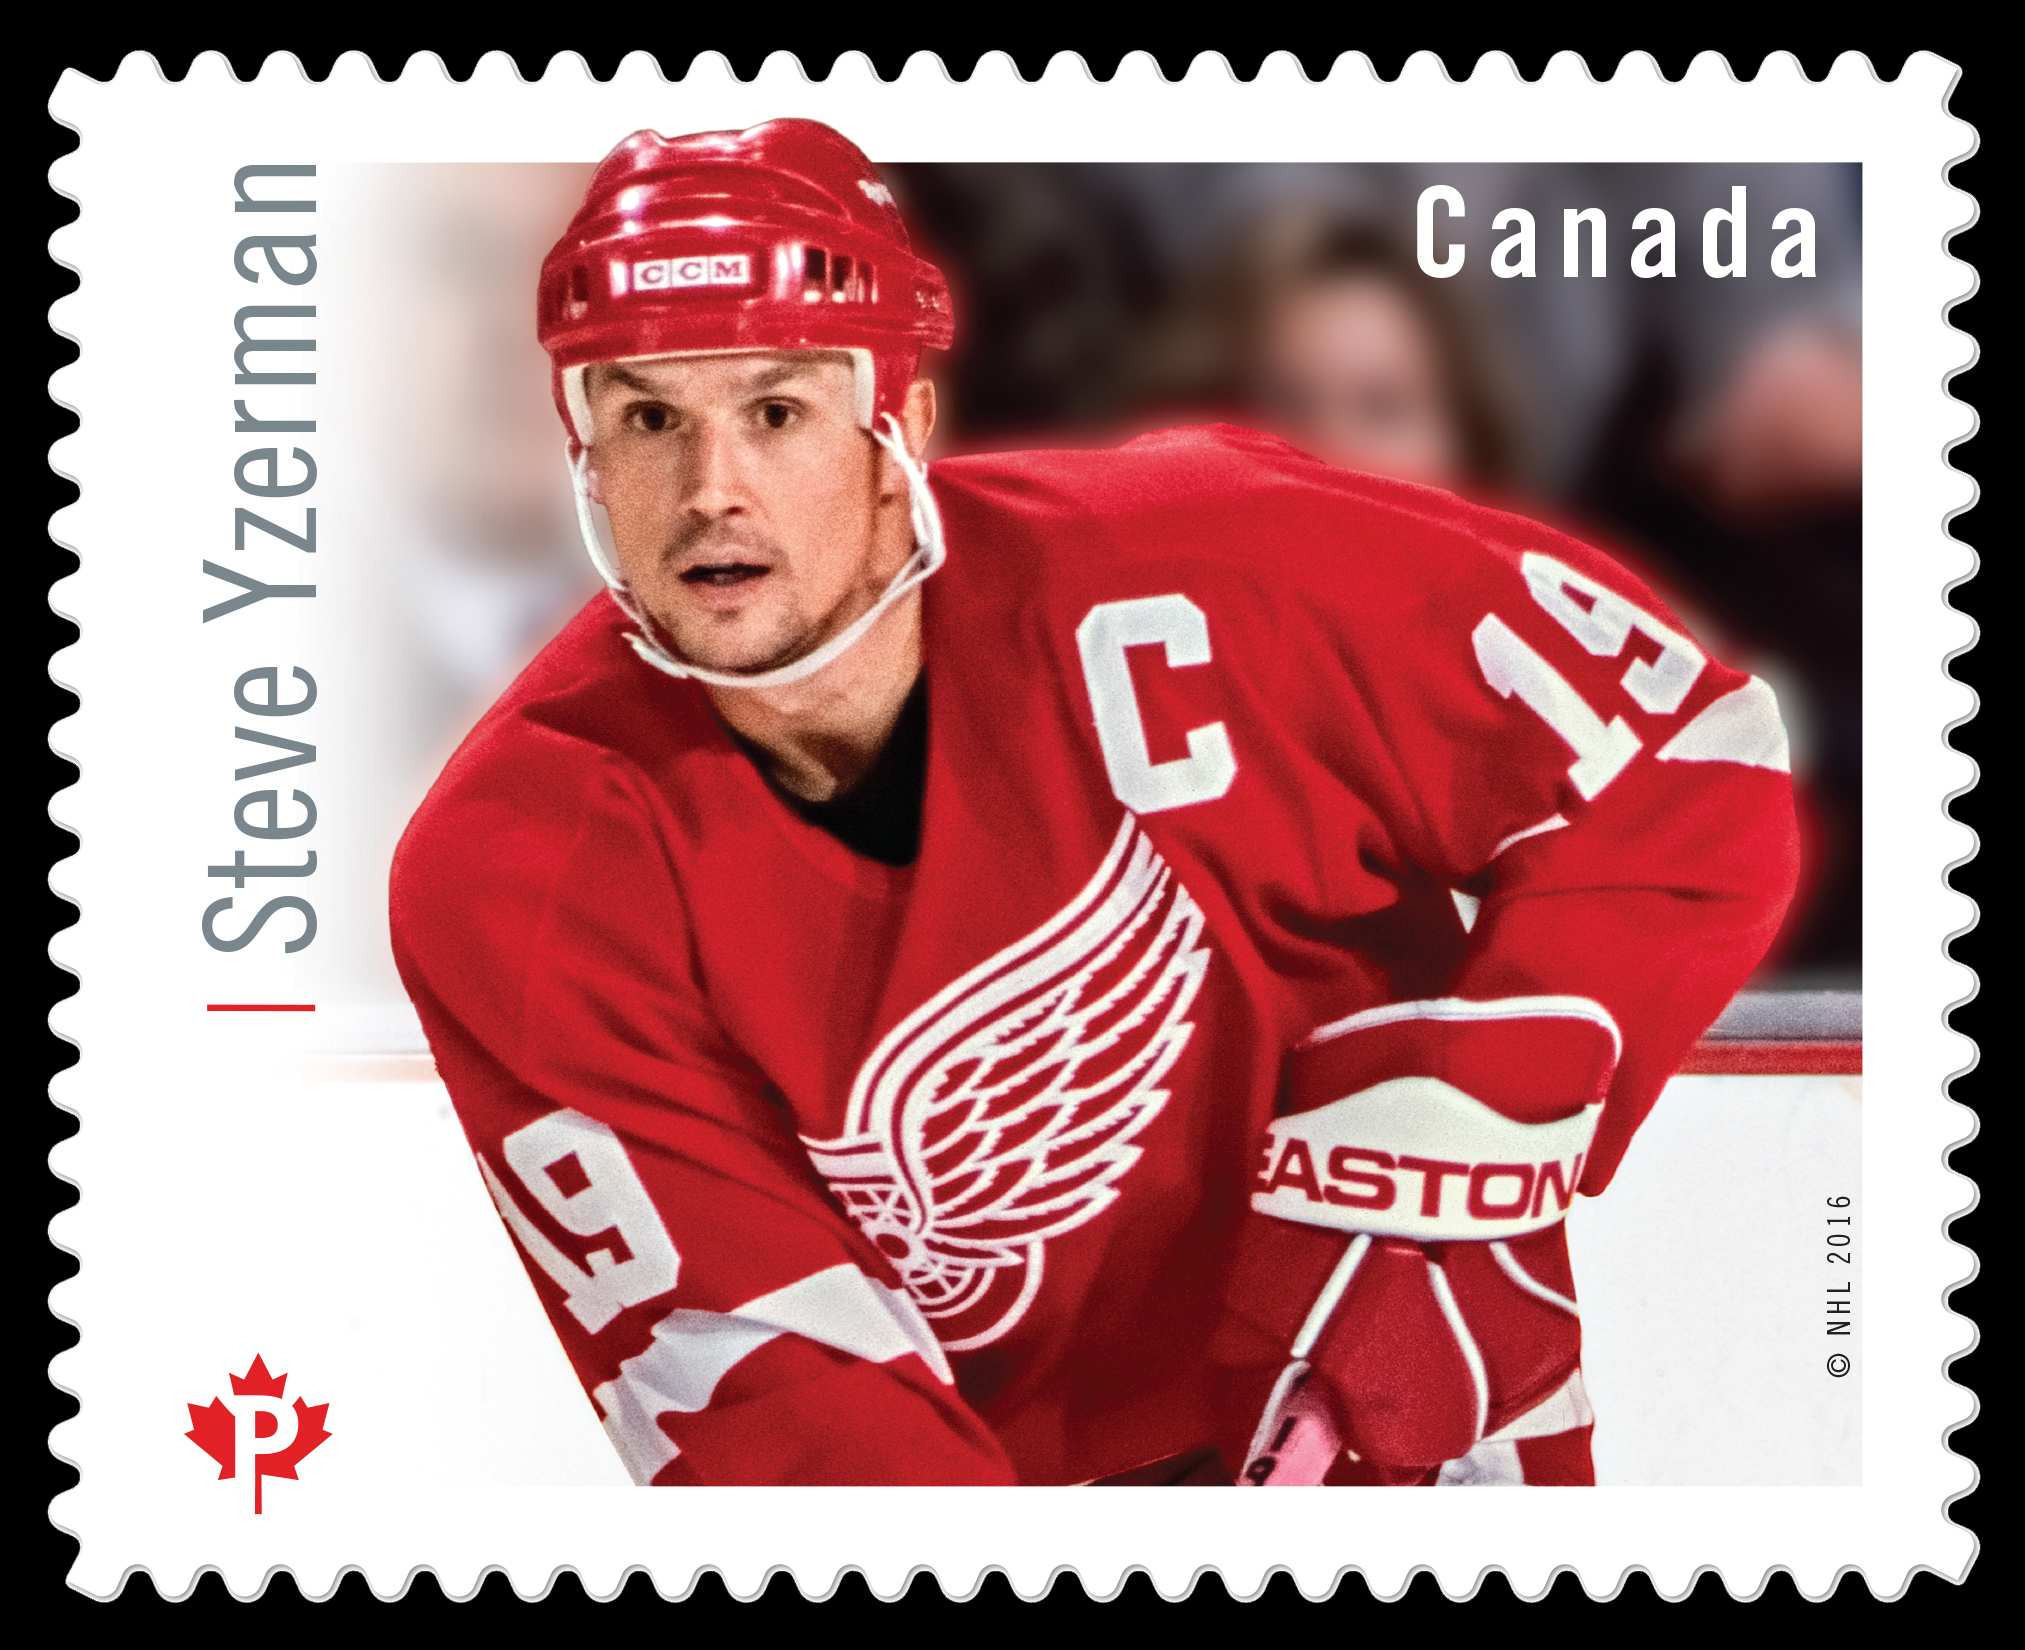 Steve Yzerman Canada Postage Stamp   Great Canadian NHL Hockey Forwards